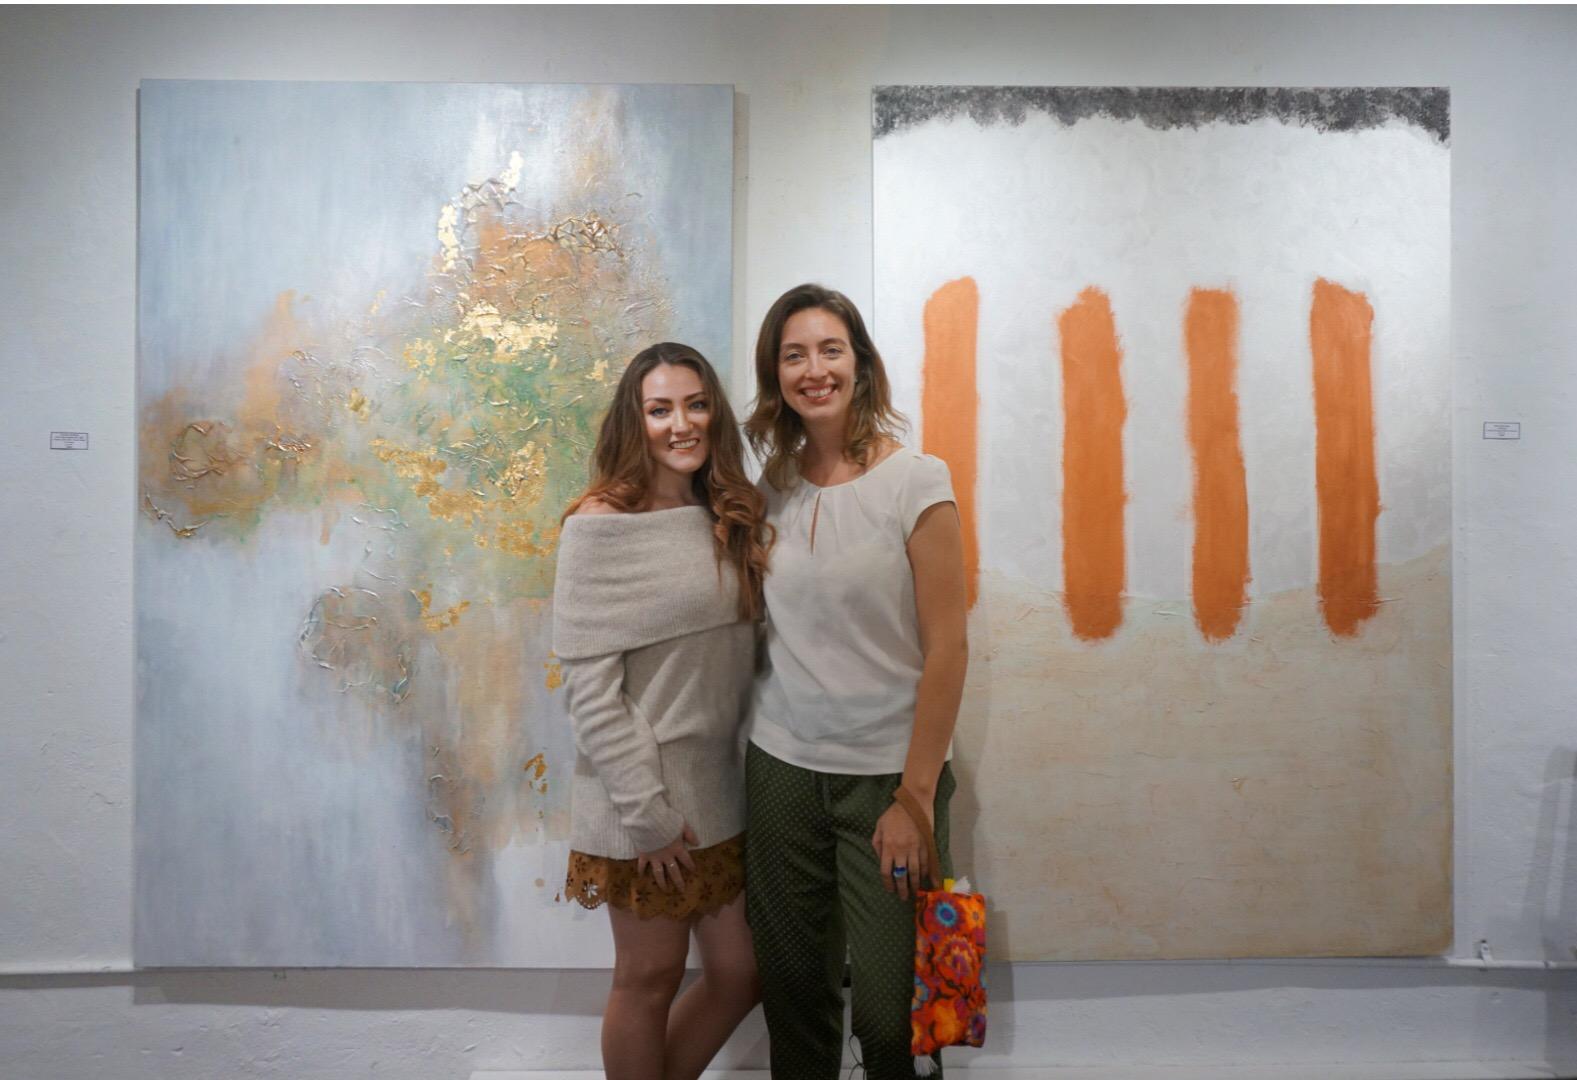 Christine Olmstead & Marta Staudinger